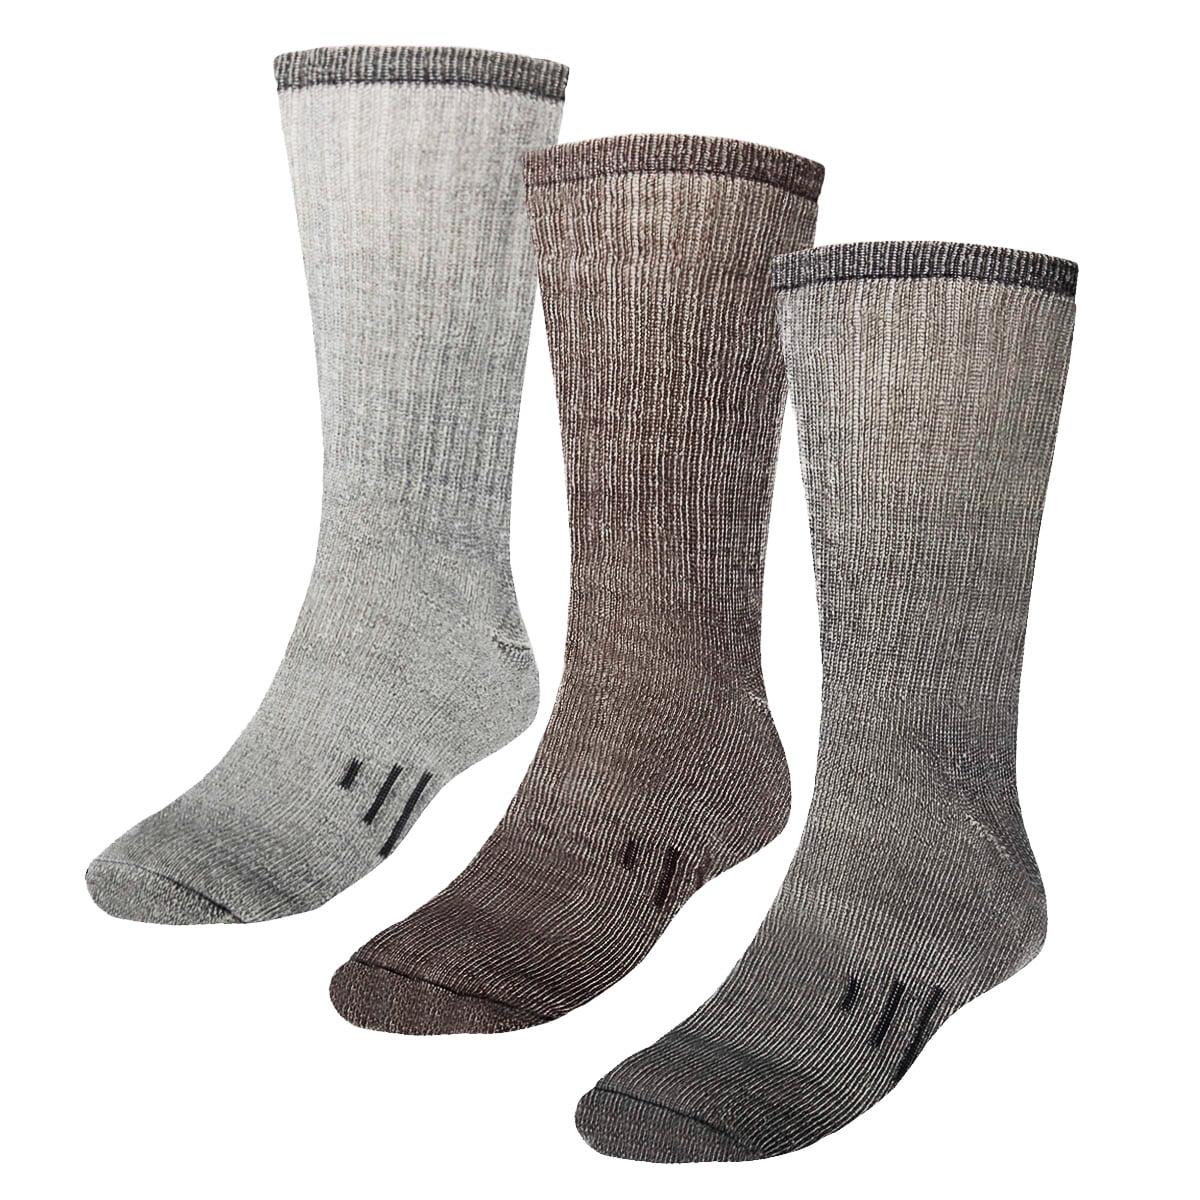 3 Pairs Thermal 80% Merino Wool Socks Thermal Hiking Crew Winter Men's Women's